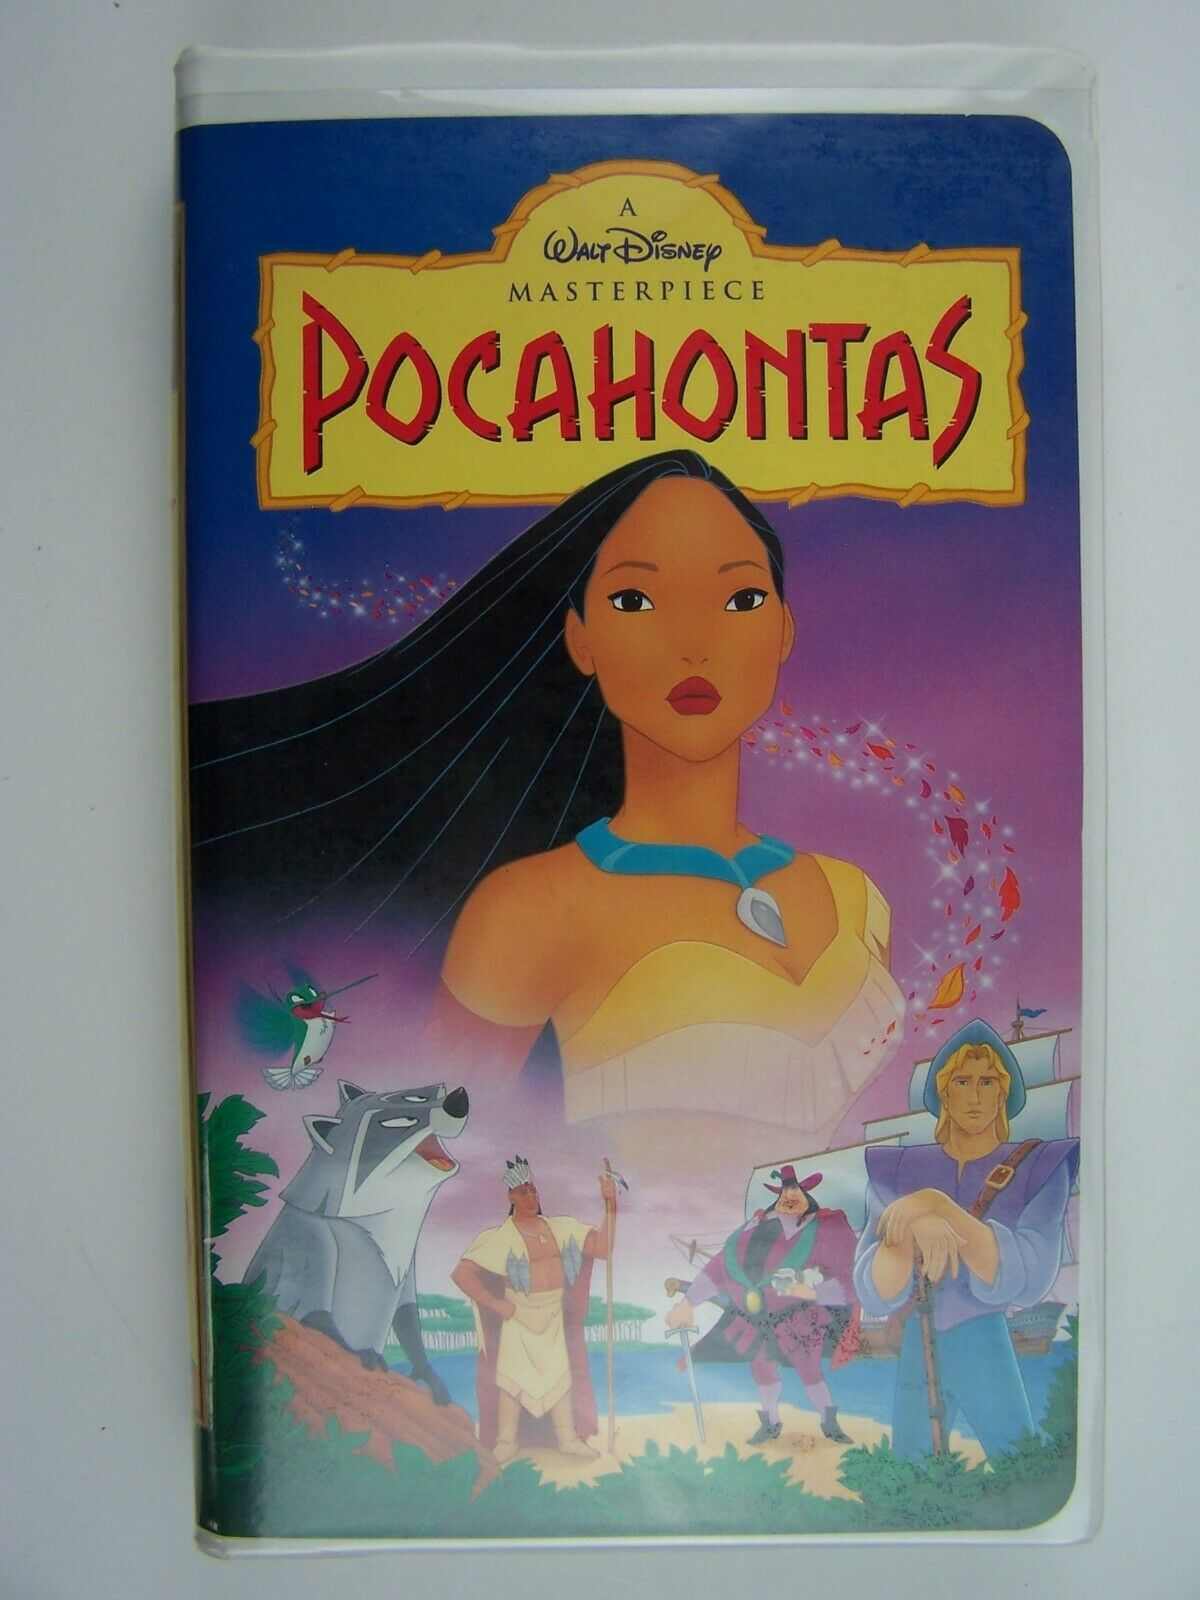 Walt Disney's Masterpiece Pocahontas VHS Video Tape 786